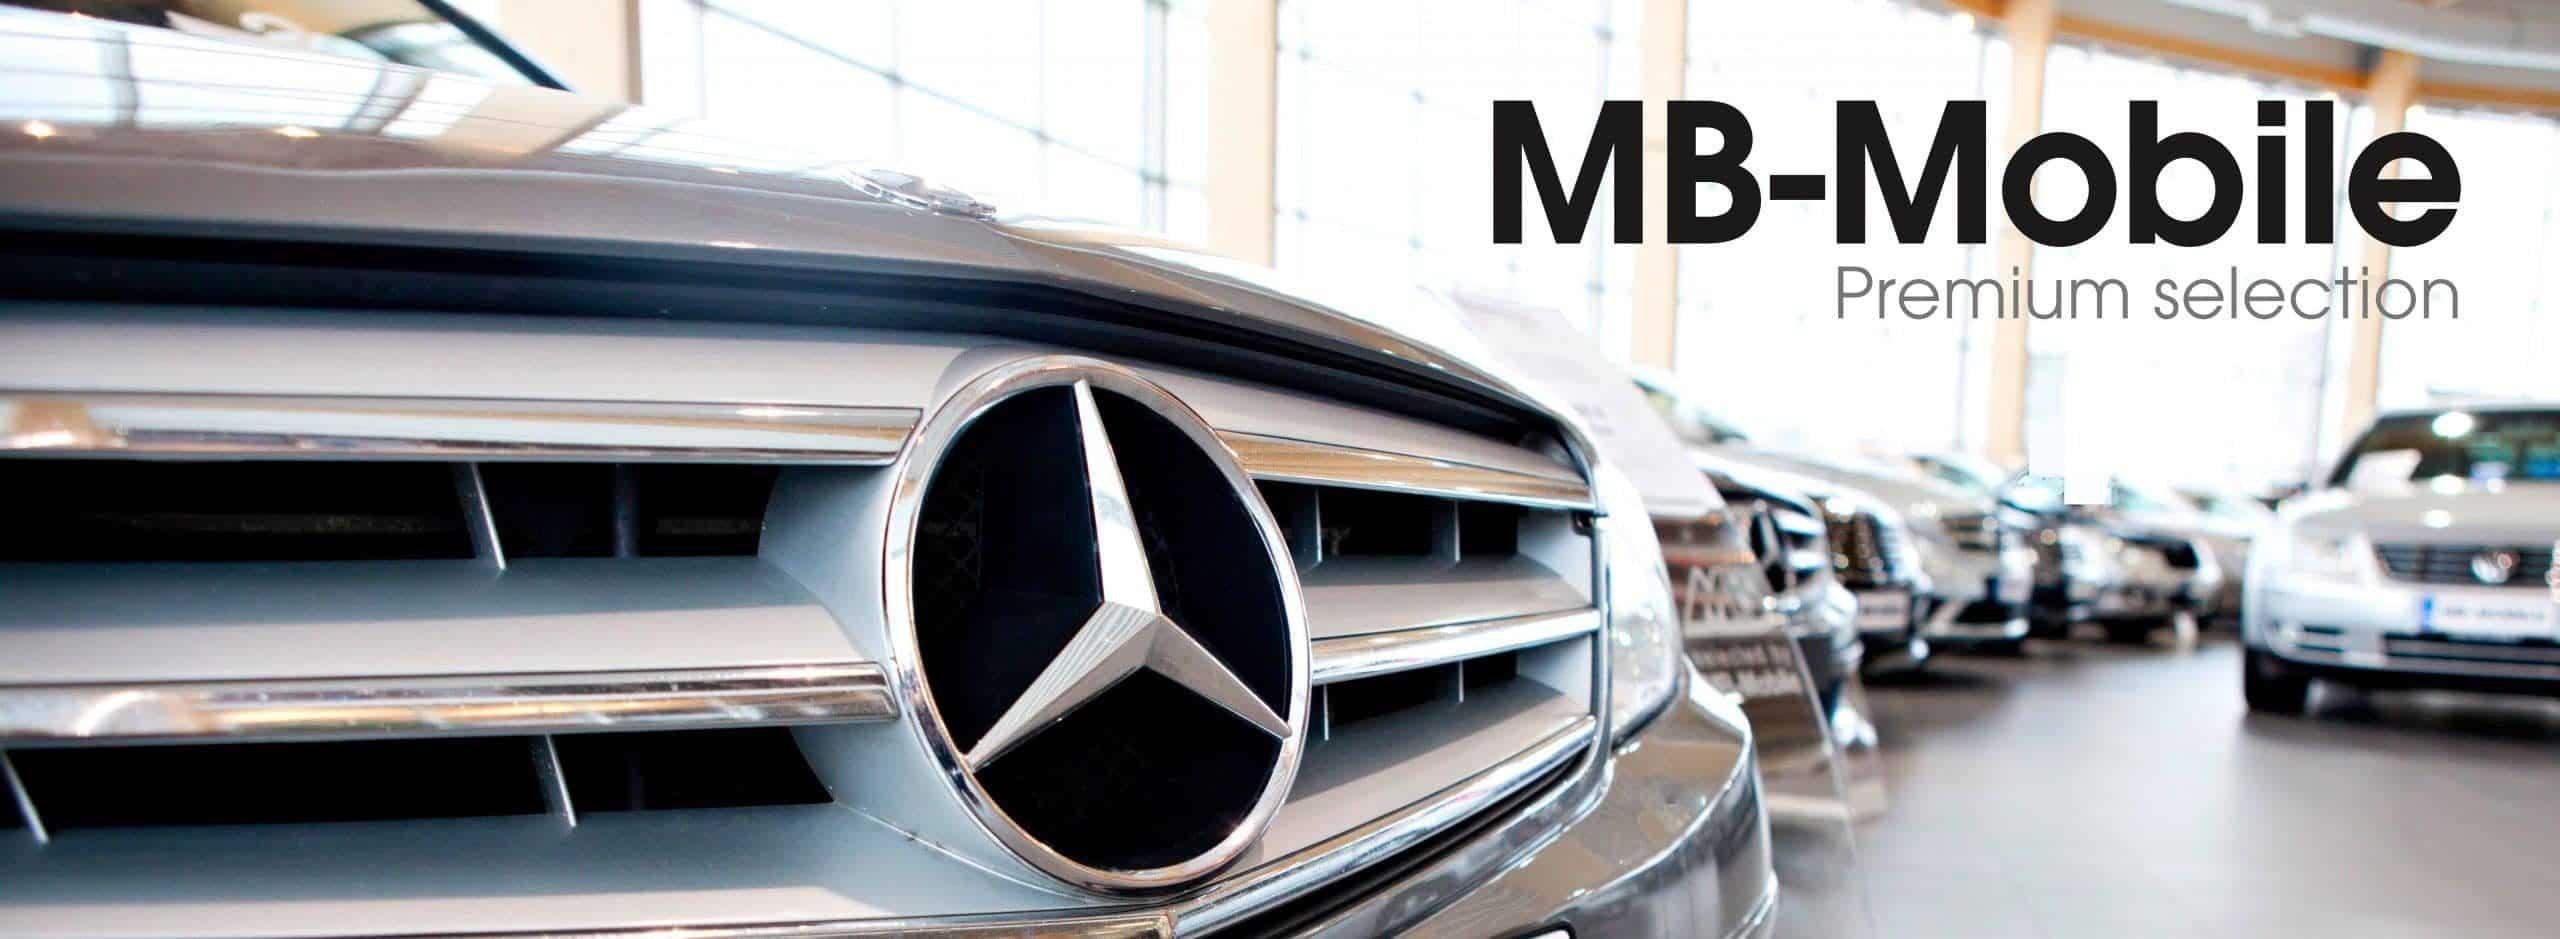 Autotalo MB-Mobile